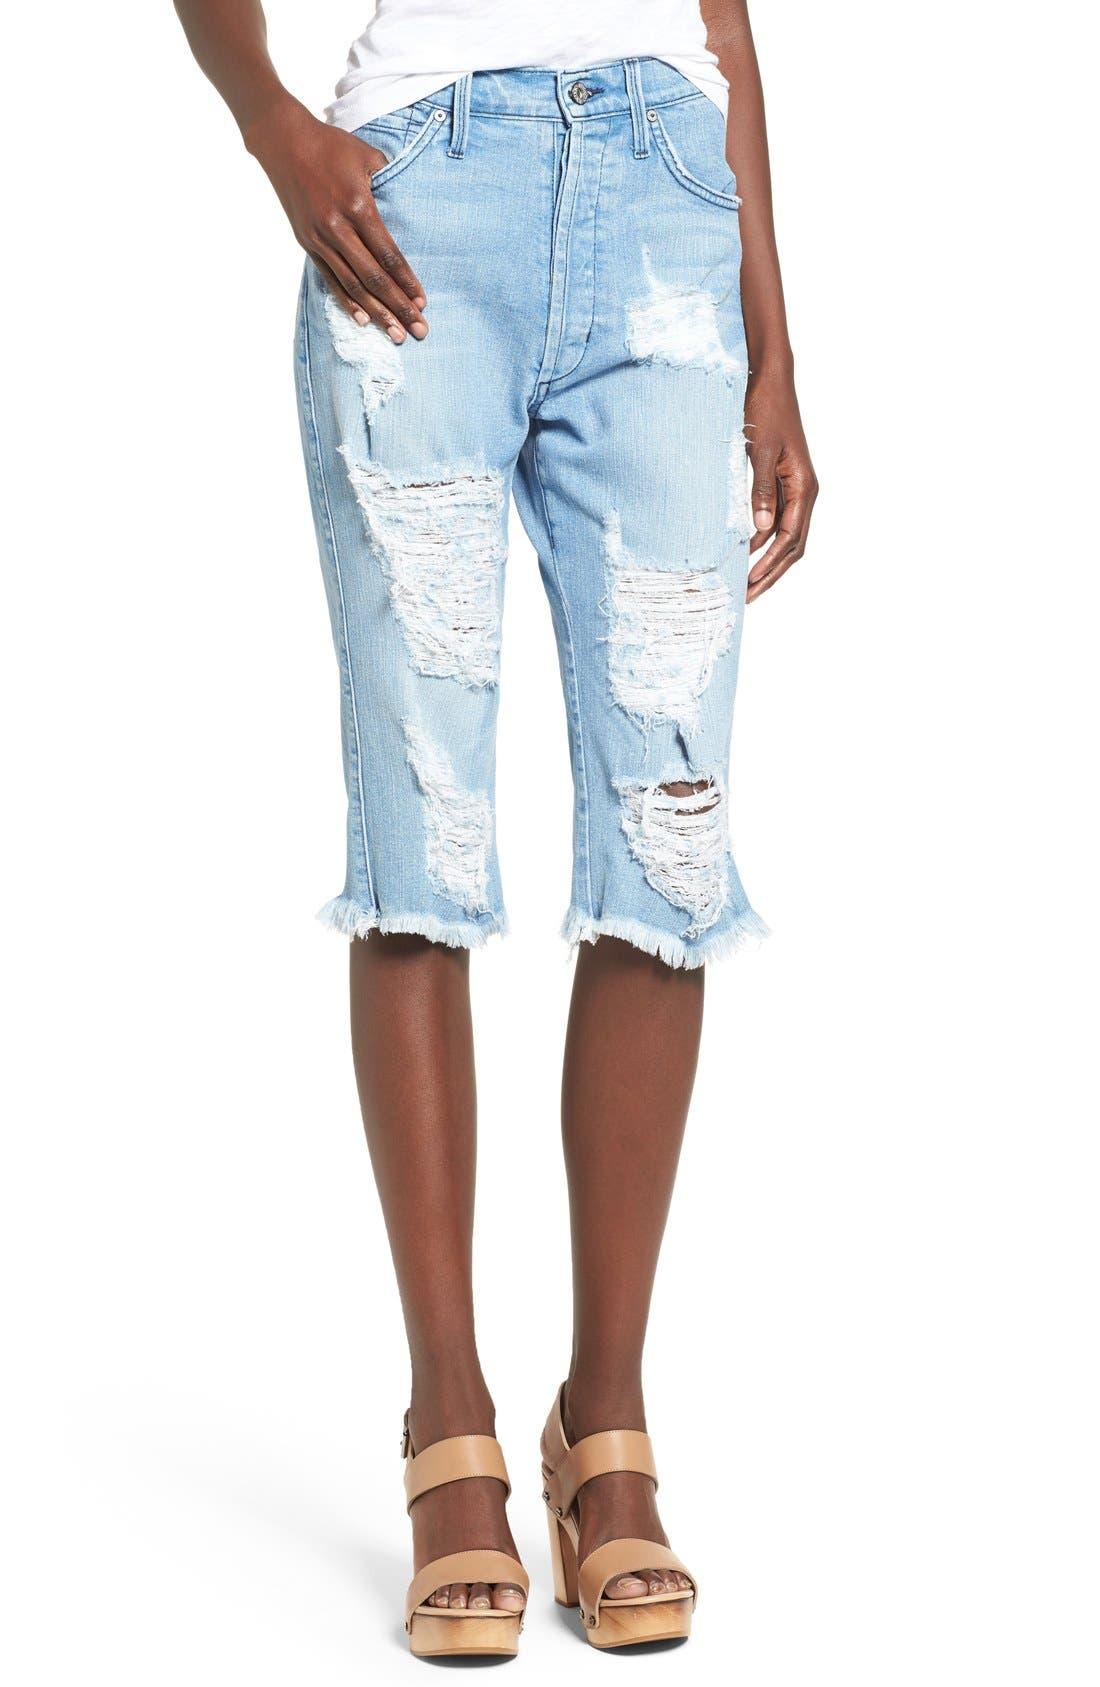 Alternate Image 1 Selected - James Jeans Distressed Bermuda Shorts (Joy Ride)